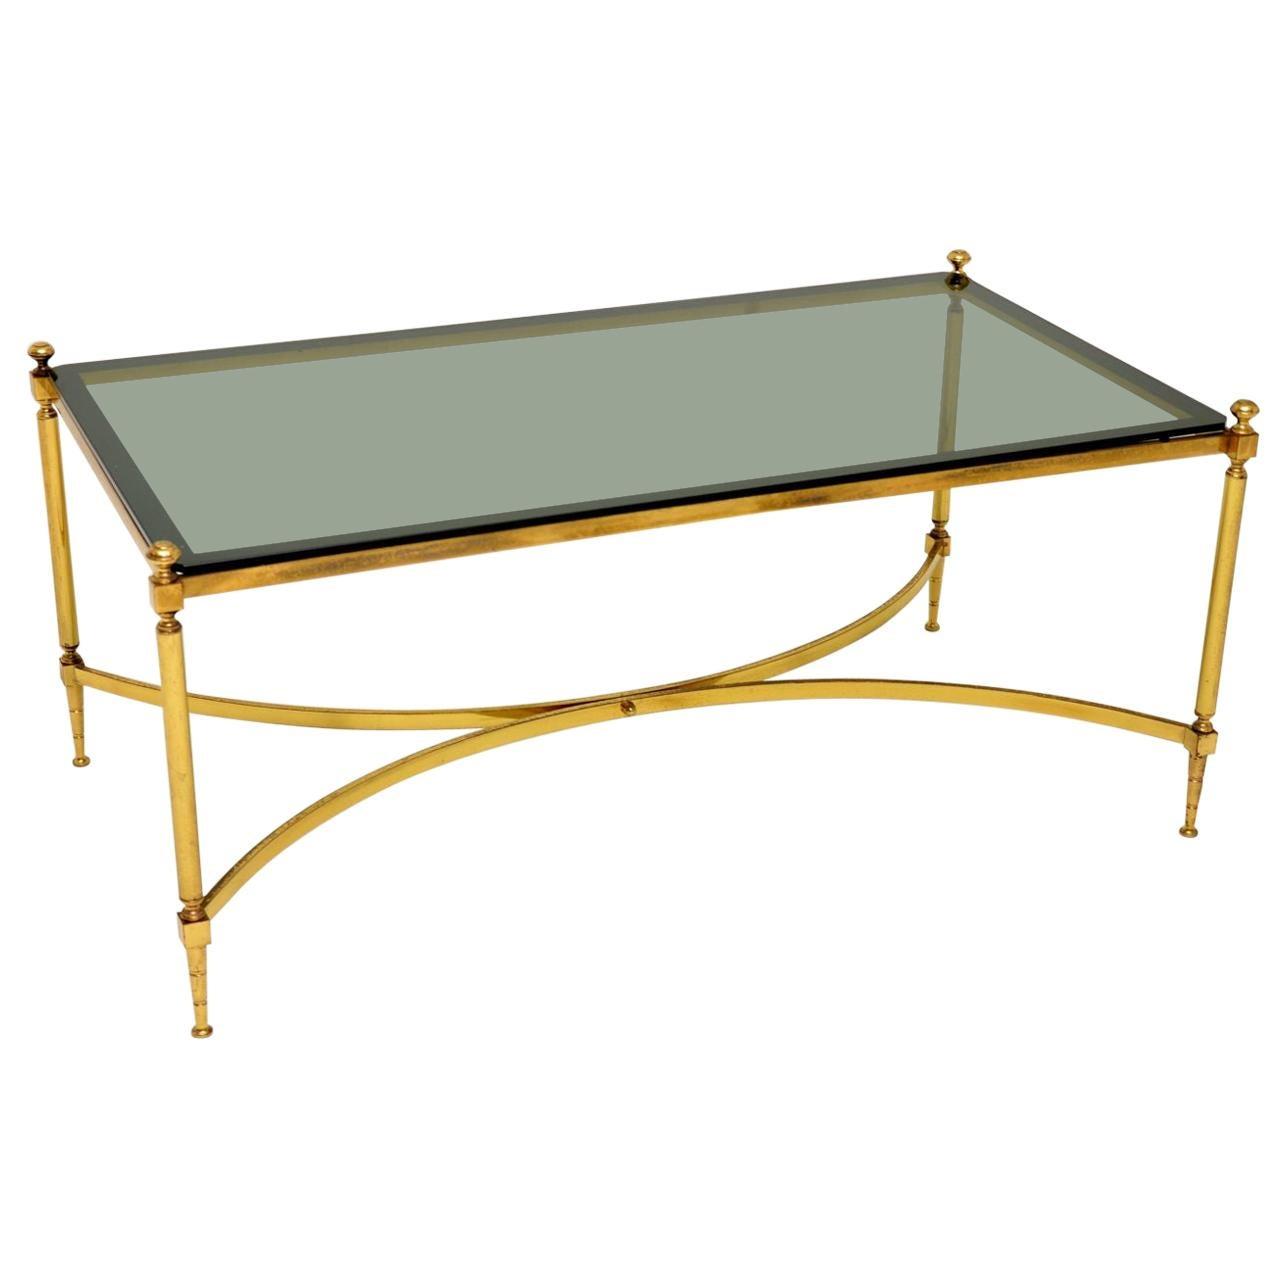 1960s Vintage Italian Brass Coffee Table